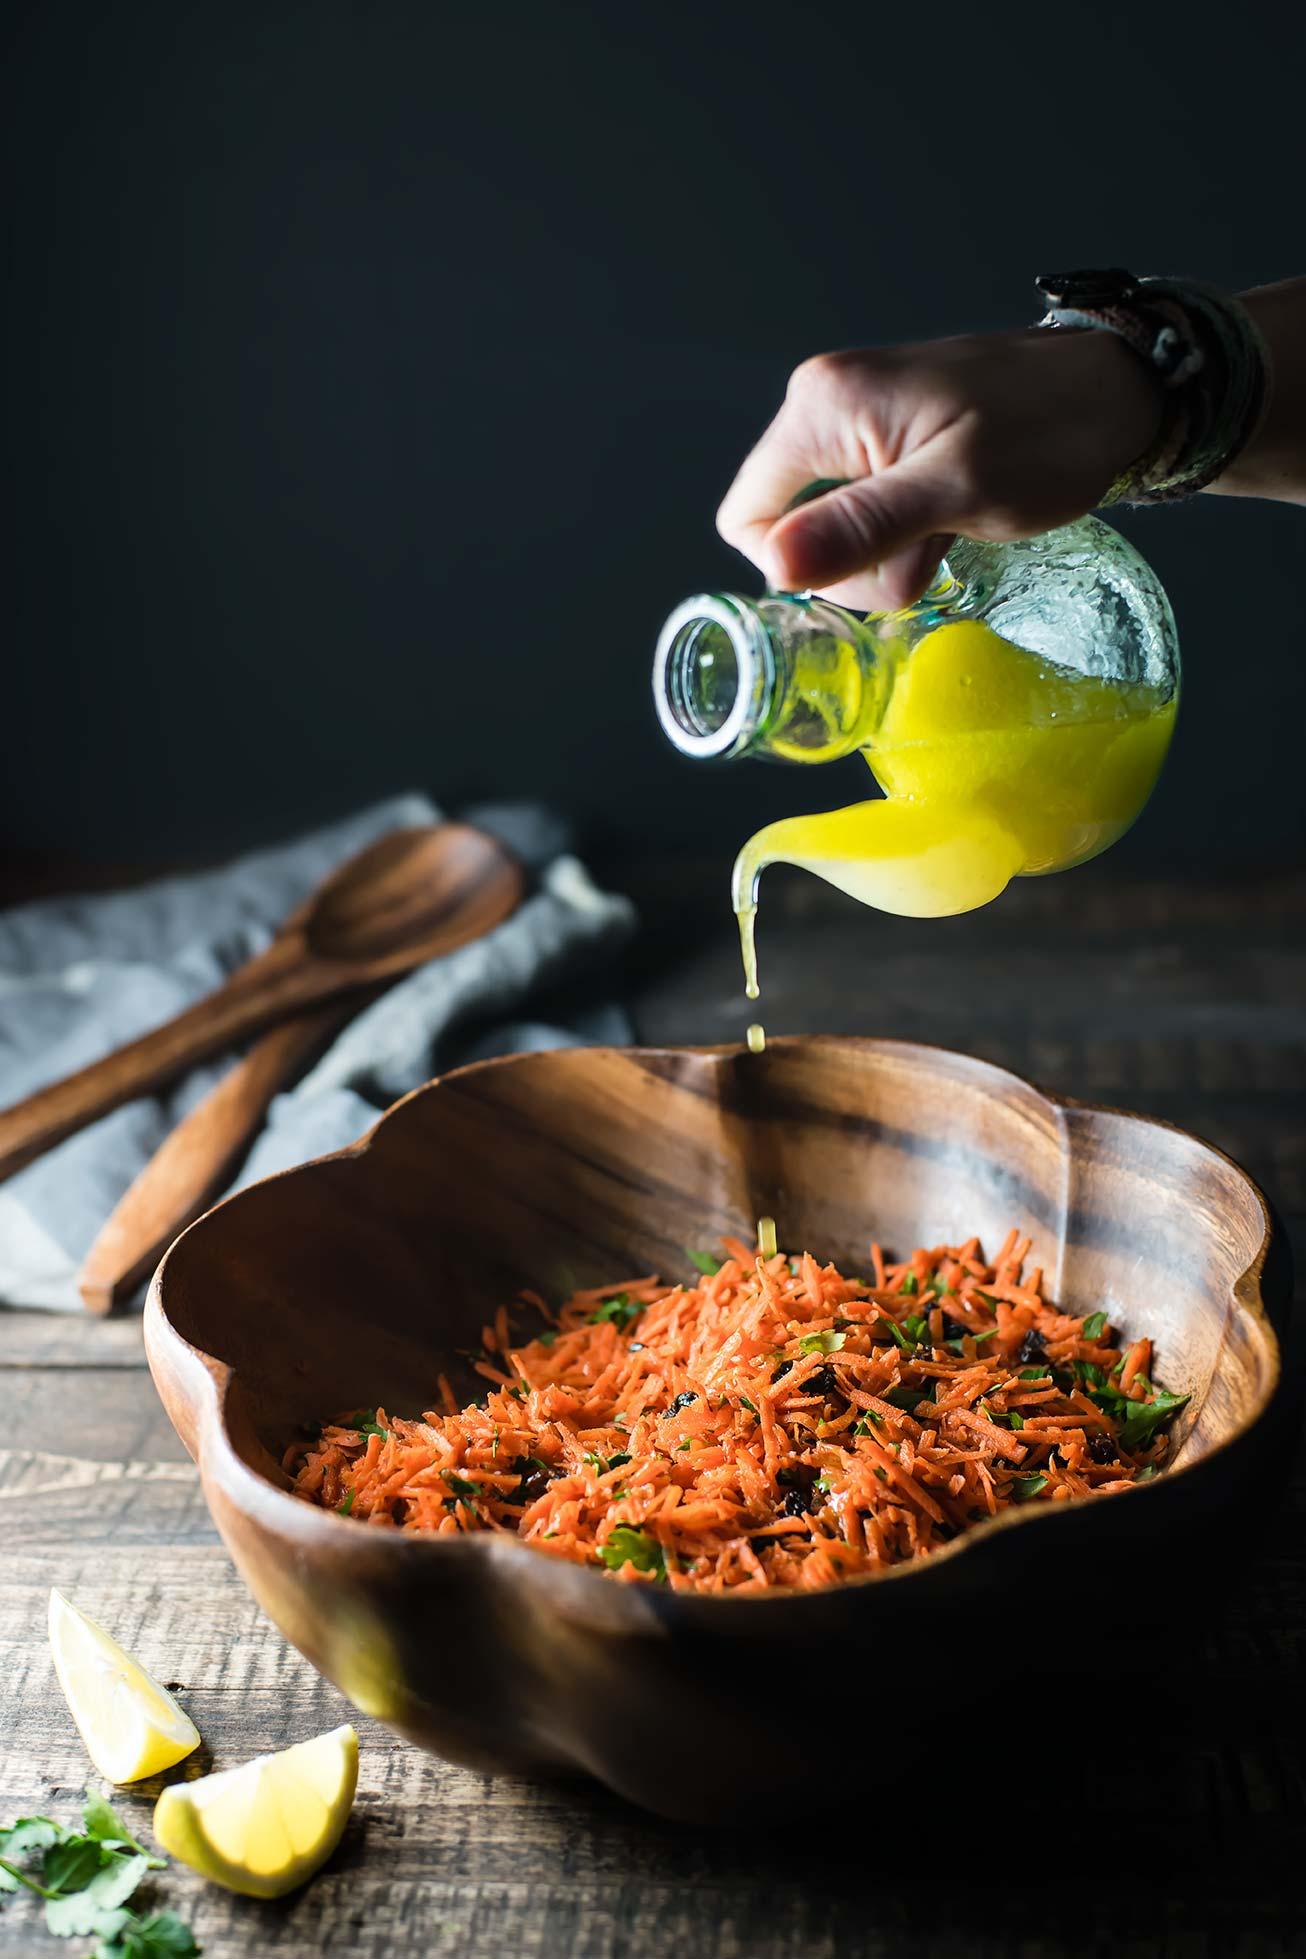 Moroccan+Spiced+Carrot+Salad+-+Paleo+and+vegan.jpeg